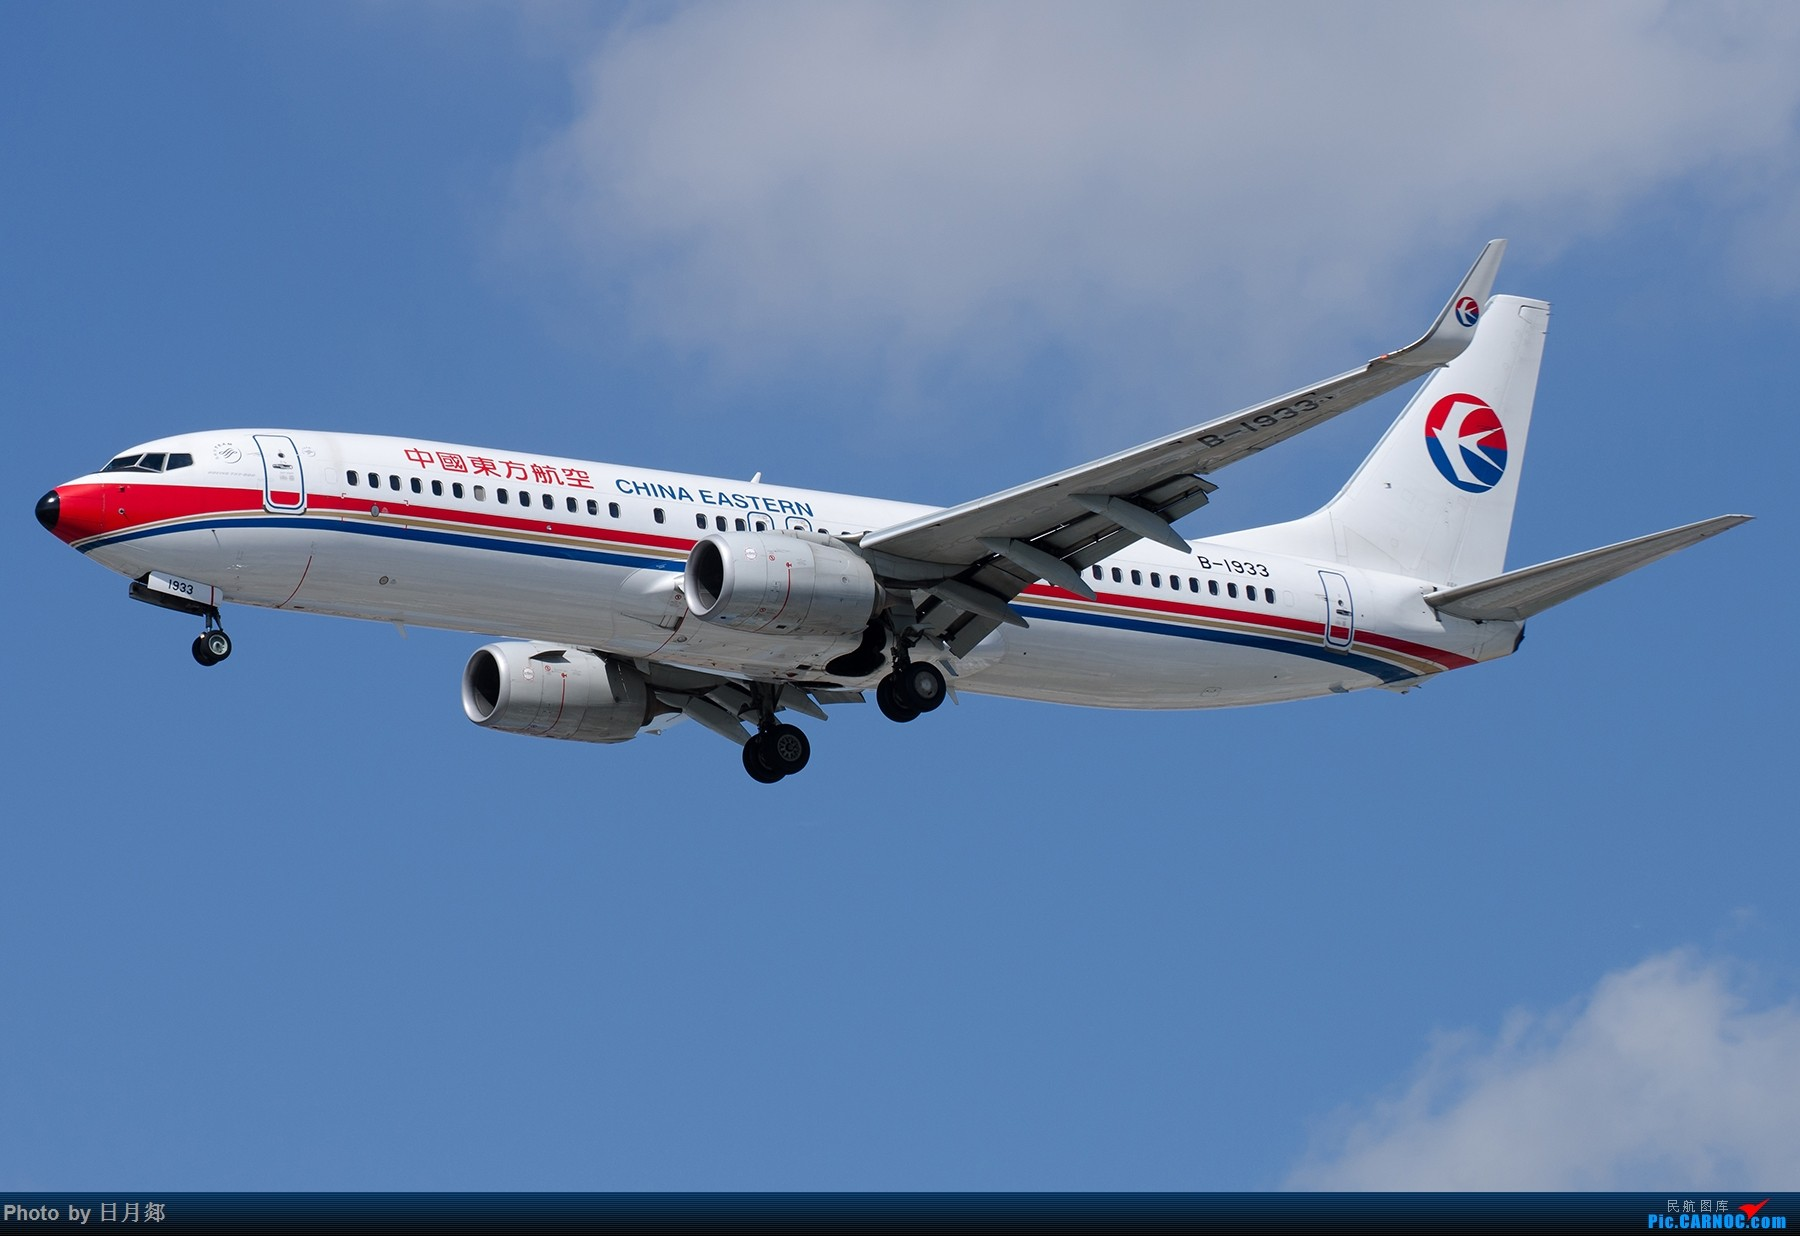 Re:[原创]【SHA拍机*1800大图】国庆的存货接着发,台风啥时候才能过去 BOEING 737-800 B-1933 中国上海虹桥国际机场